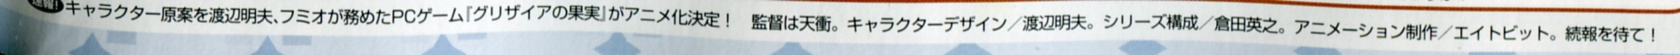 Grisaia no Kajitsu Anime Studio Revealed Image